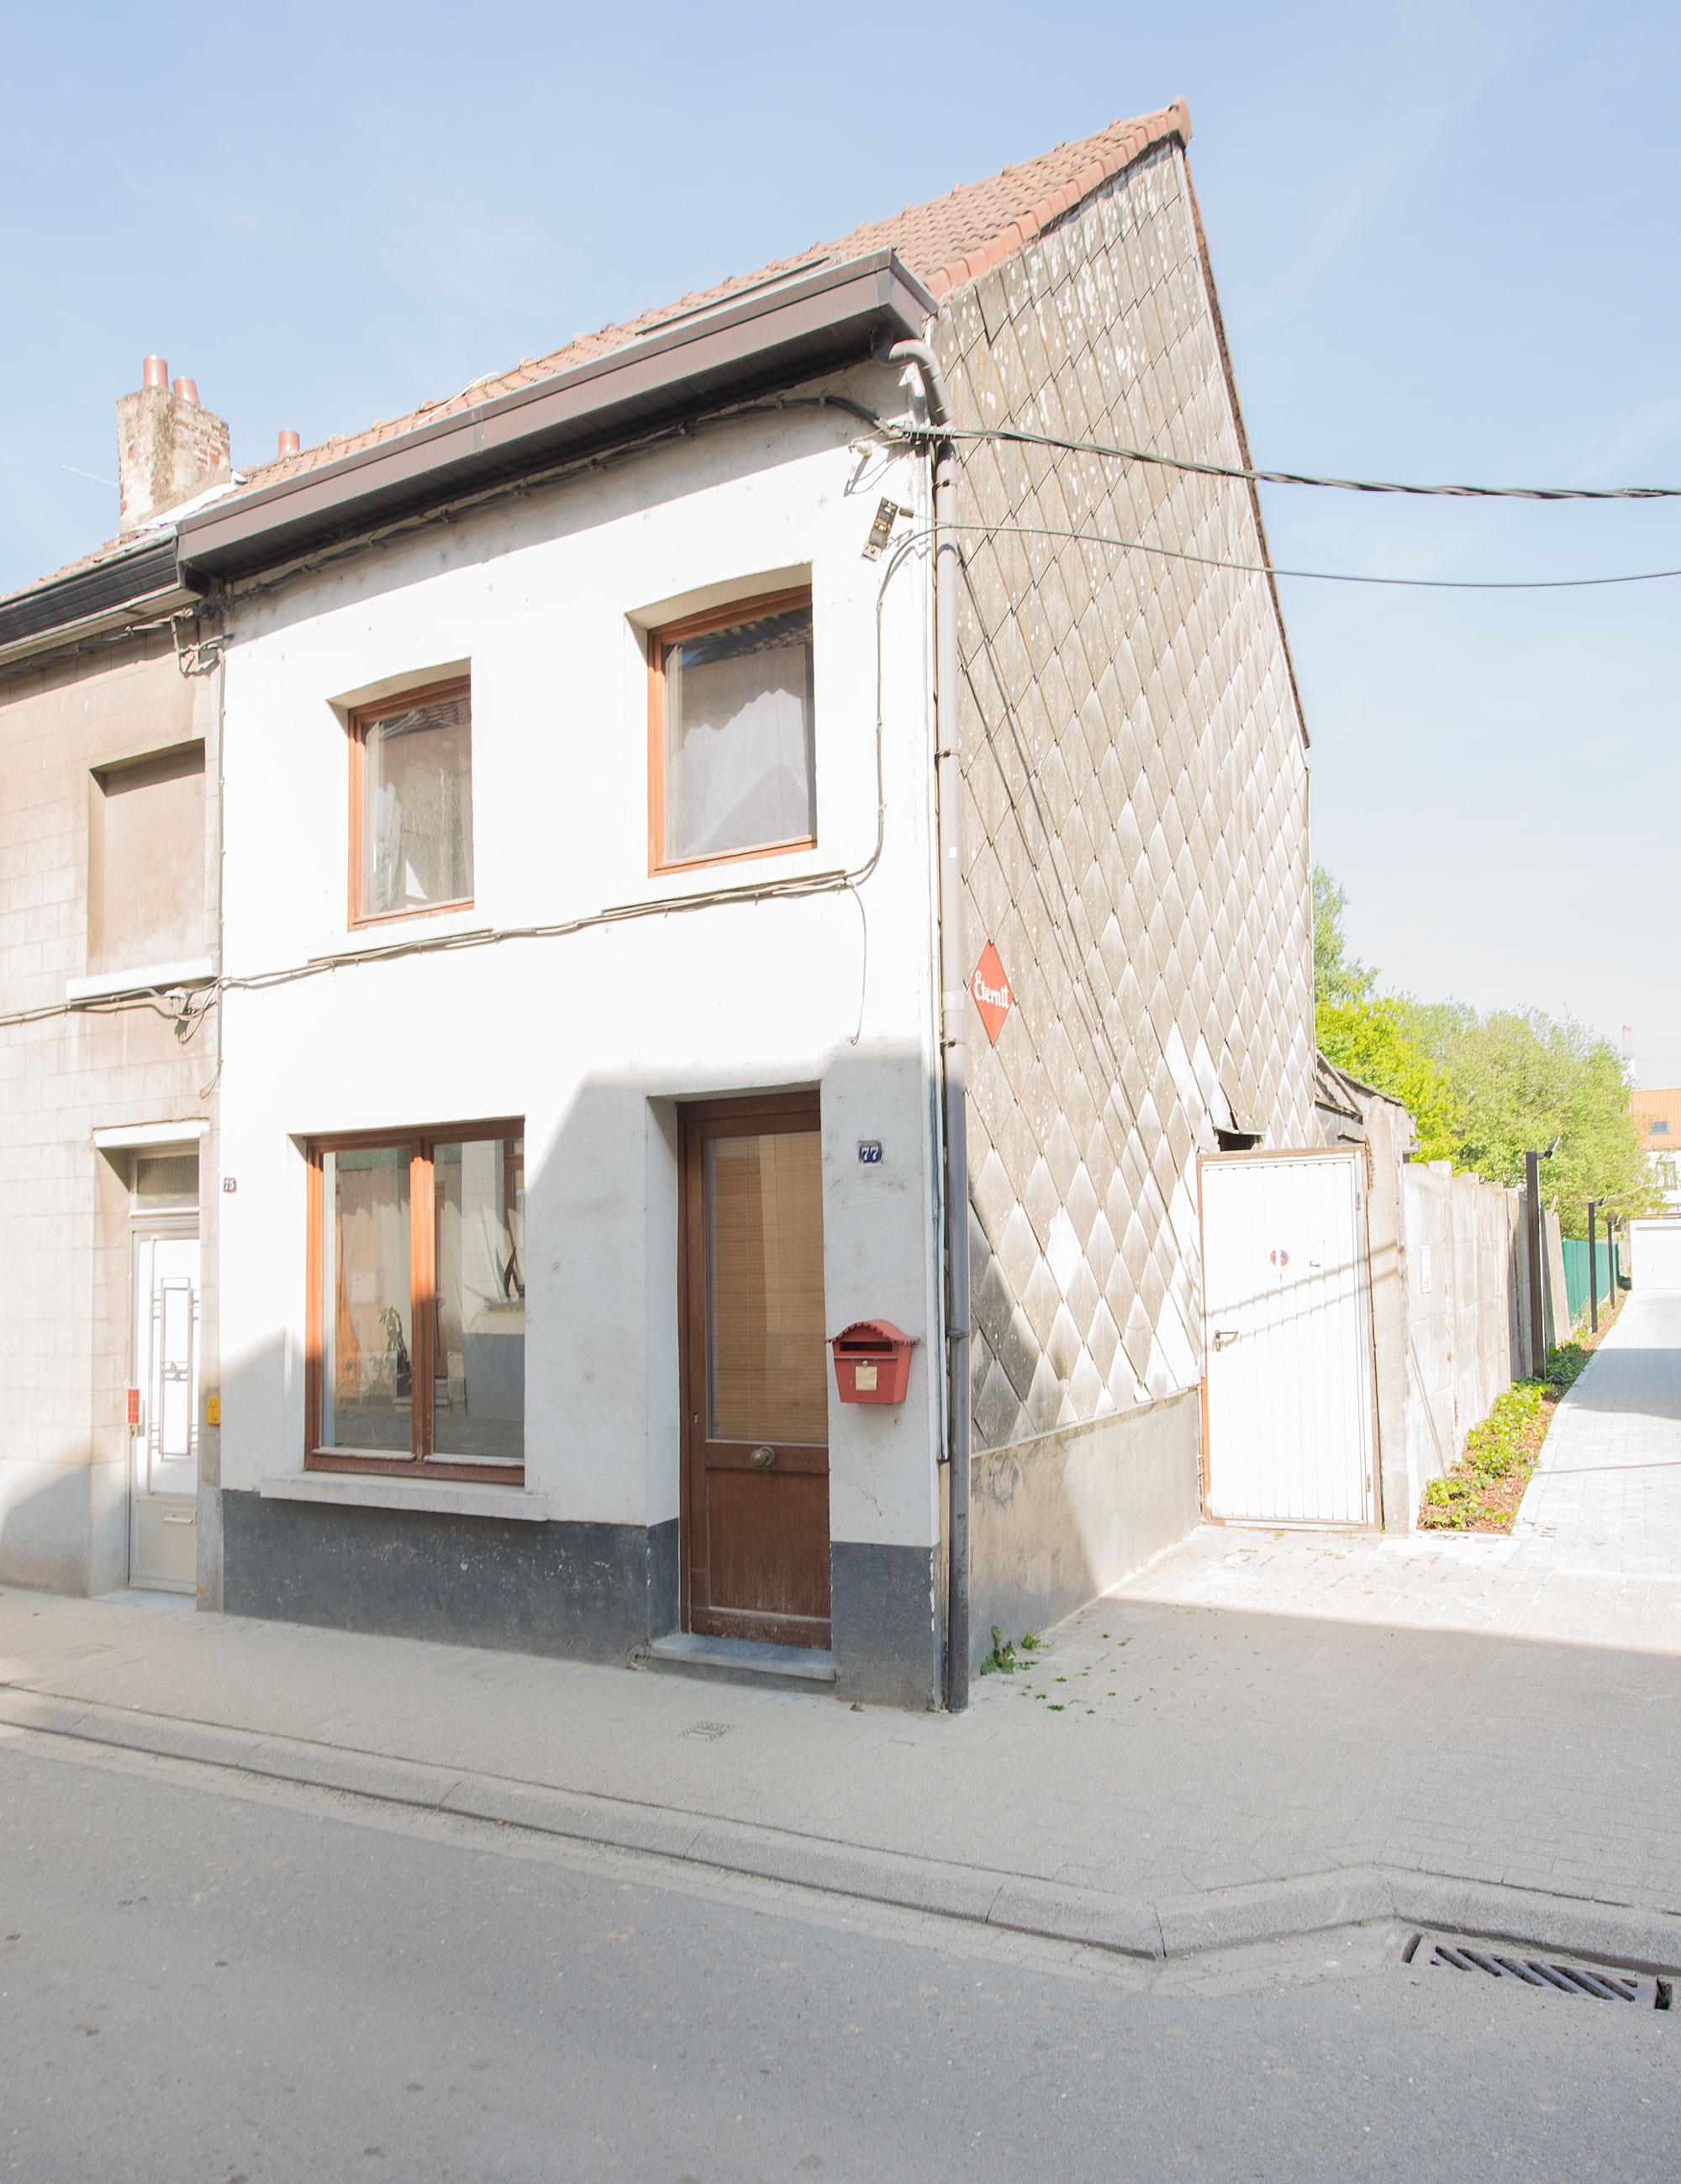 Maison 3 fa ades ruisbroek a vendre nos offres for Annuler offre achat maison